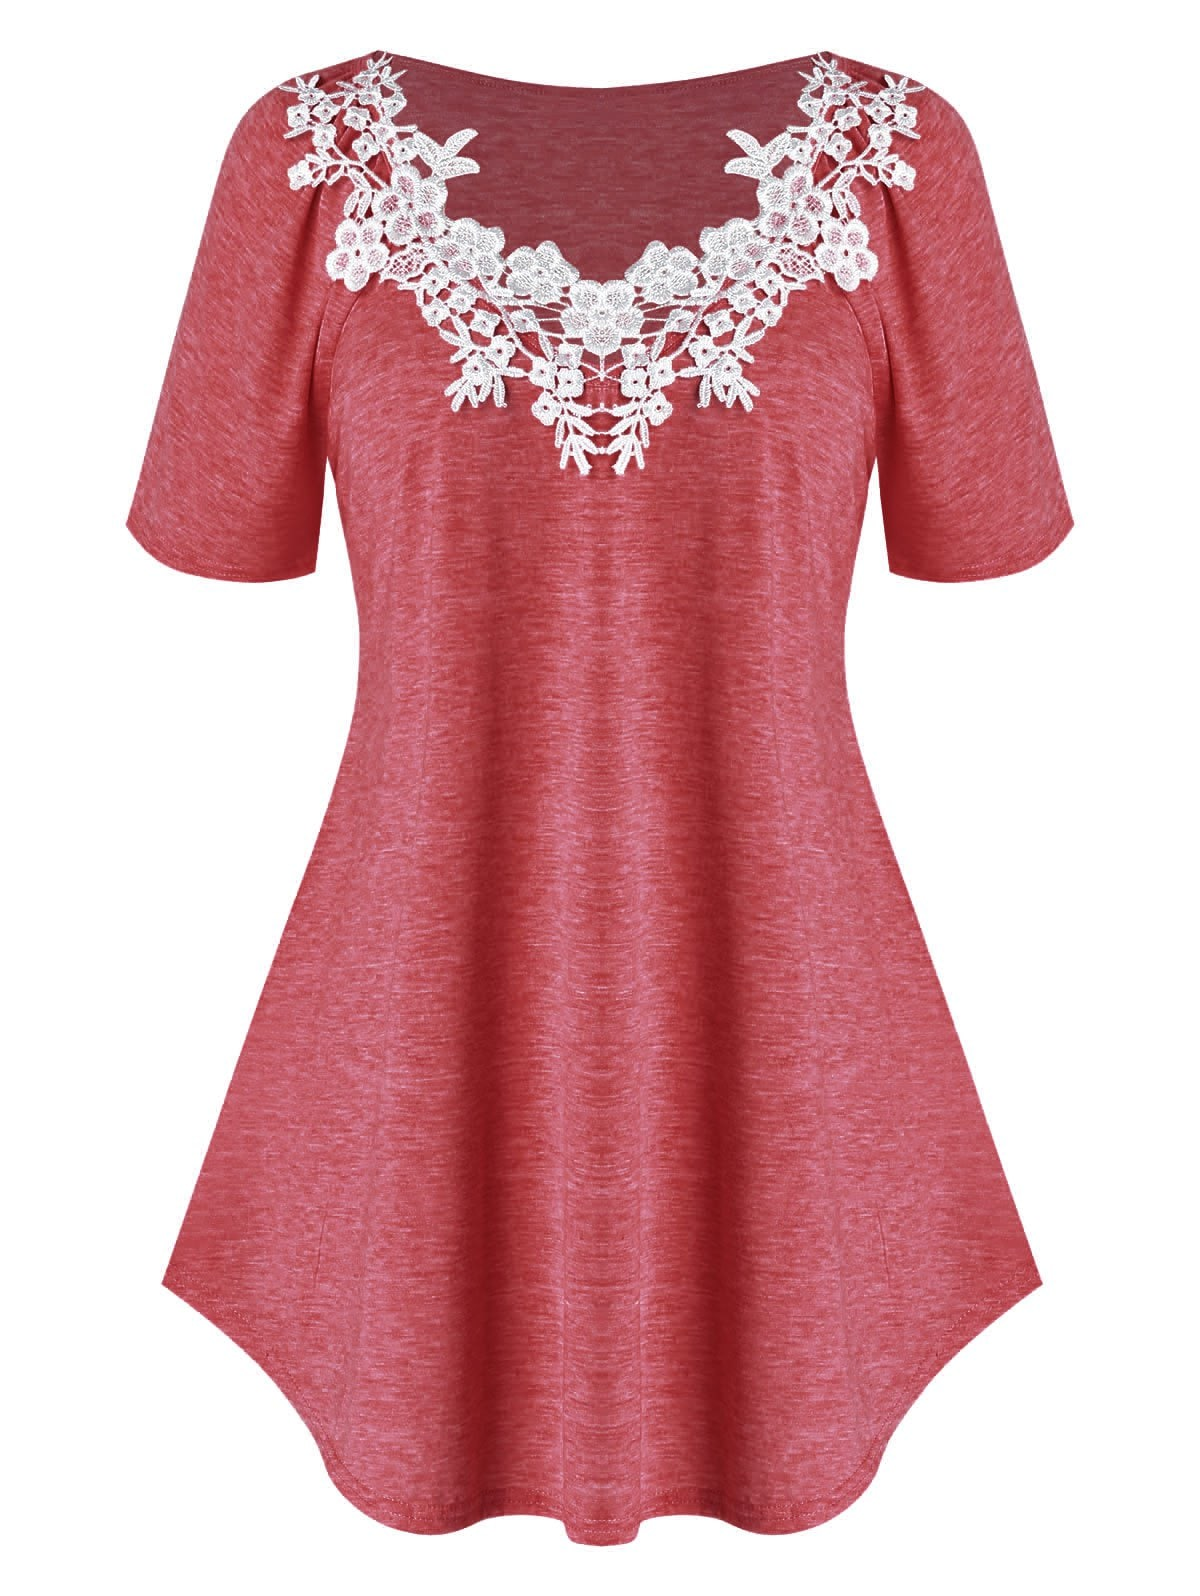 Plus Size Raglan Sleeve Lace Guipure T Shirt